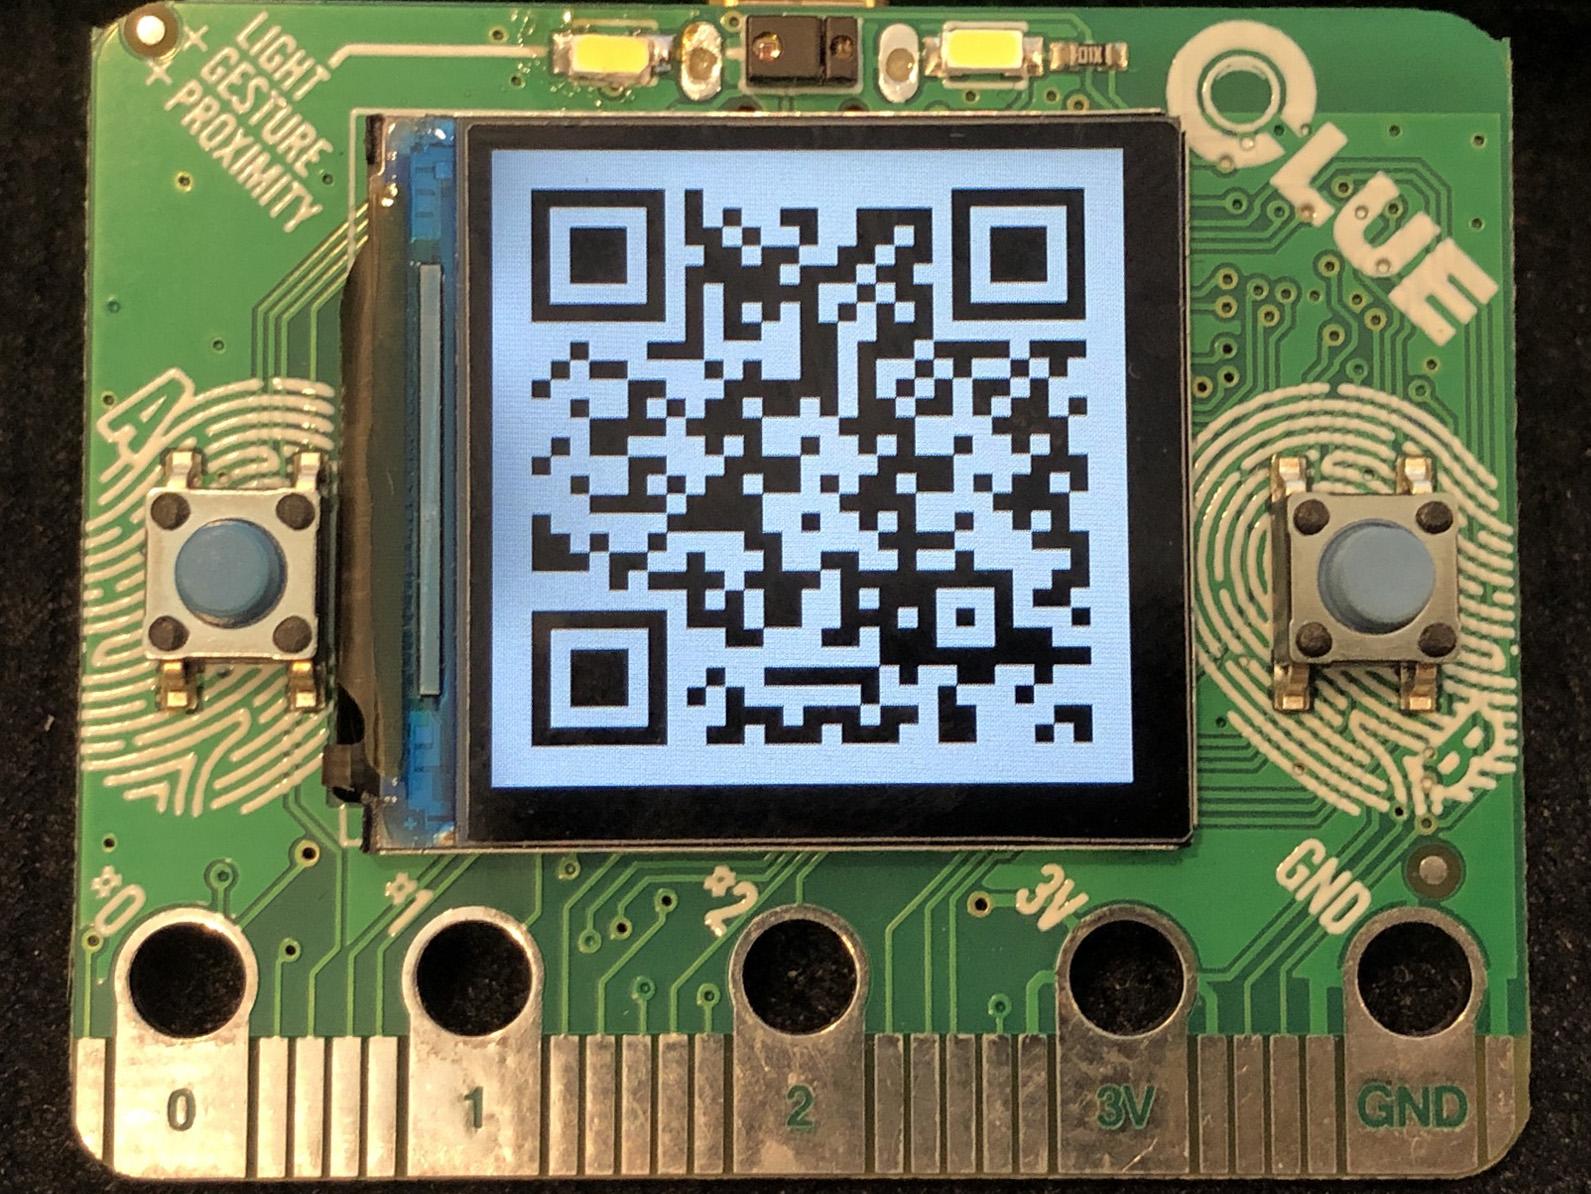 circuitpython_IMG_0966.jpg